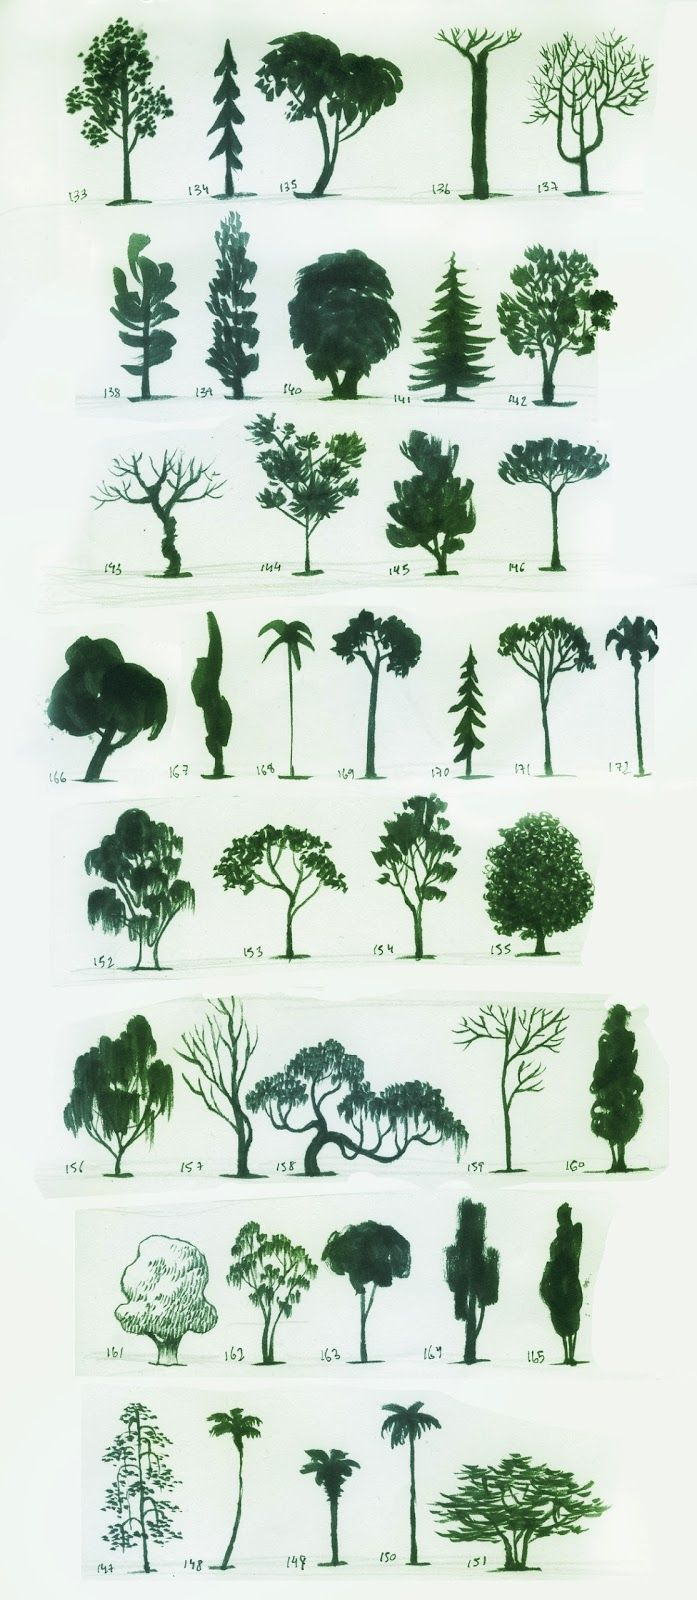 Santiago Verdugo: Trees and symbols